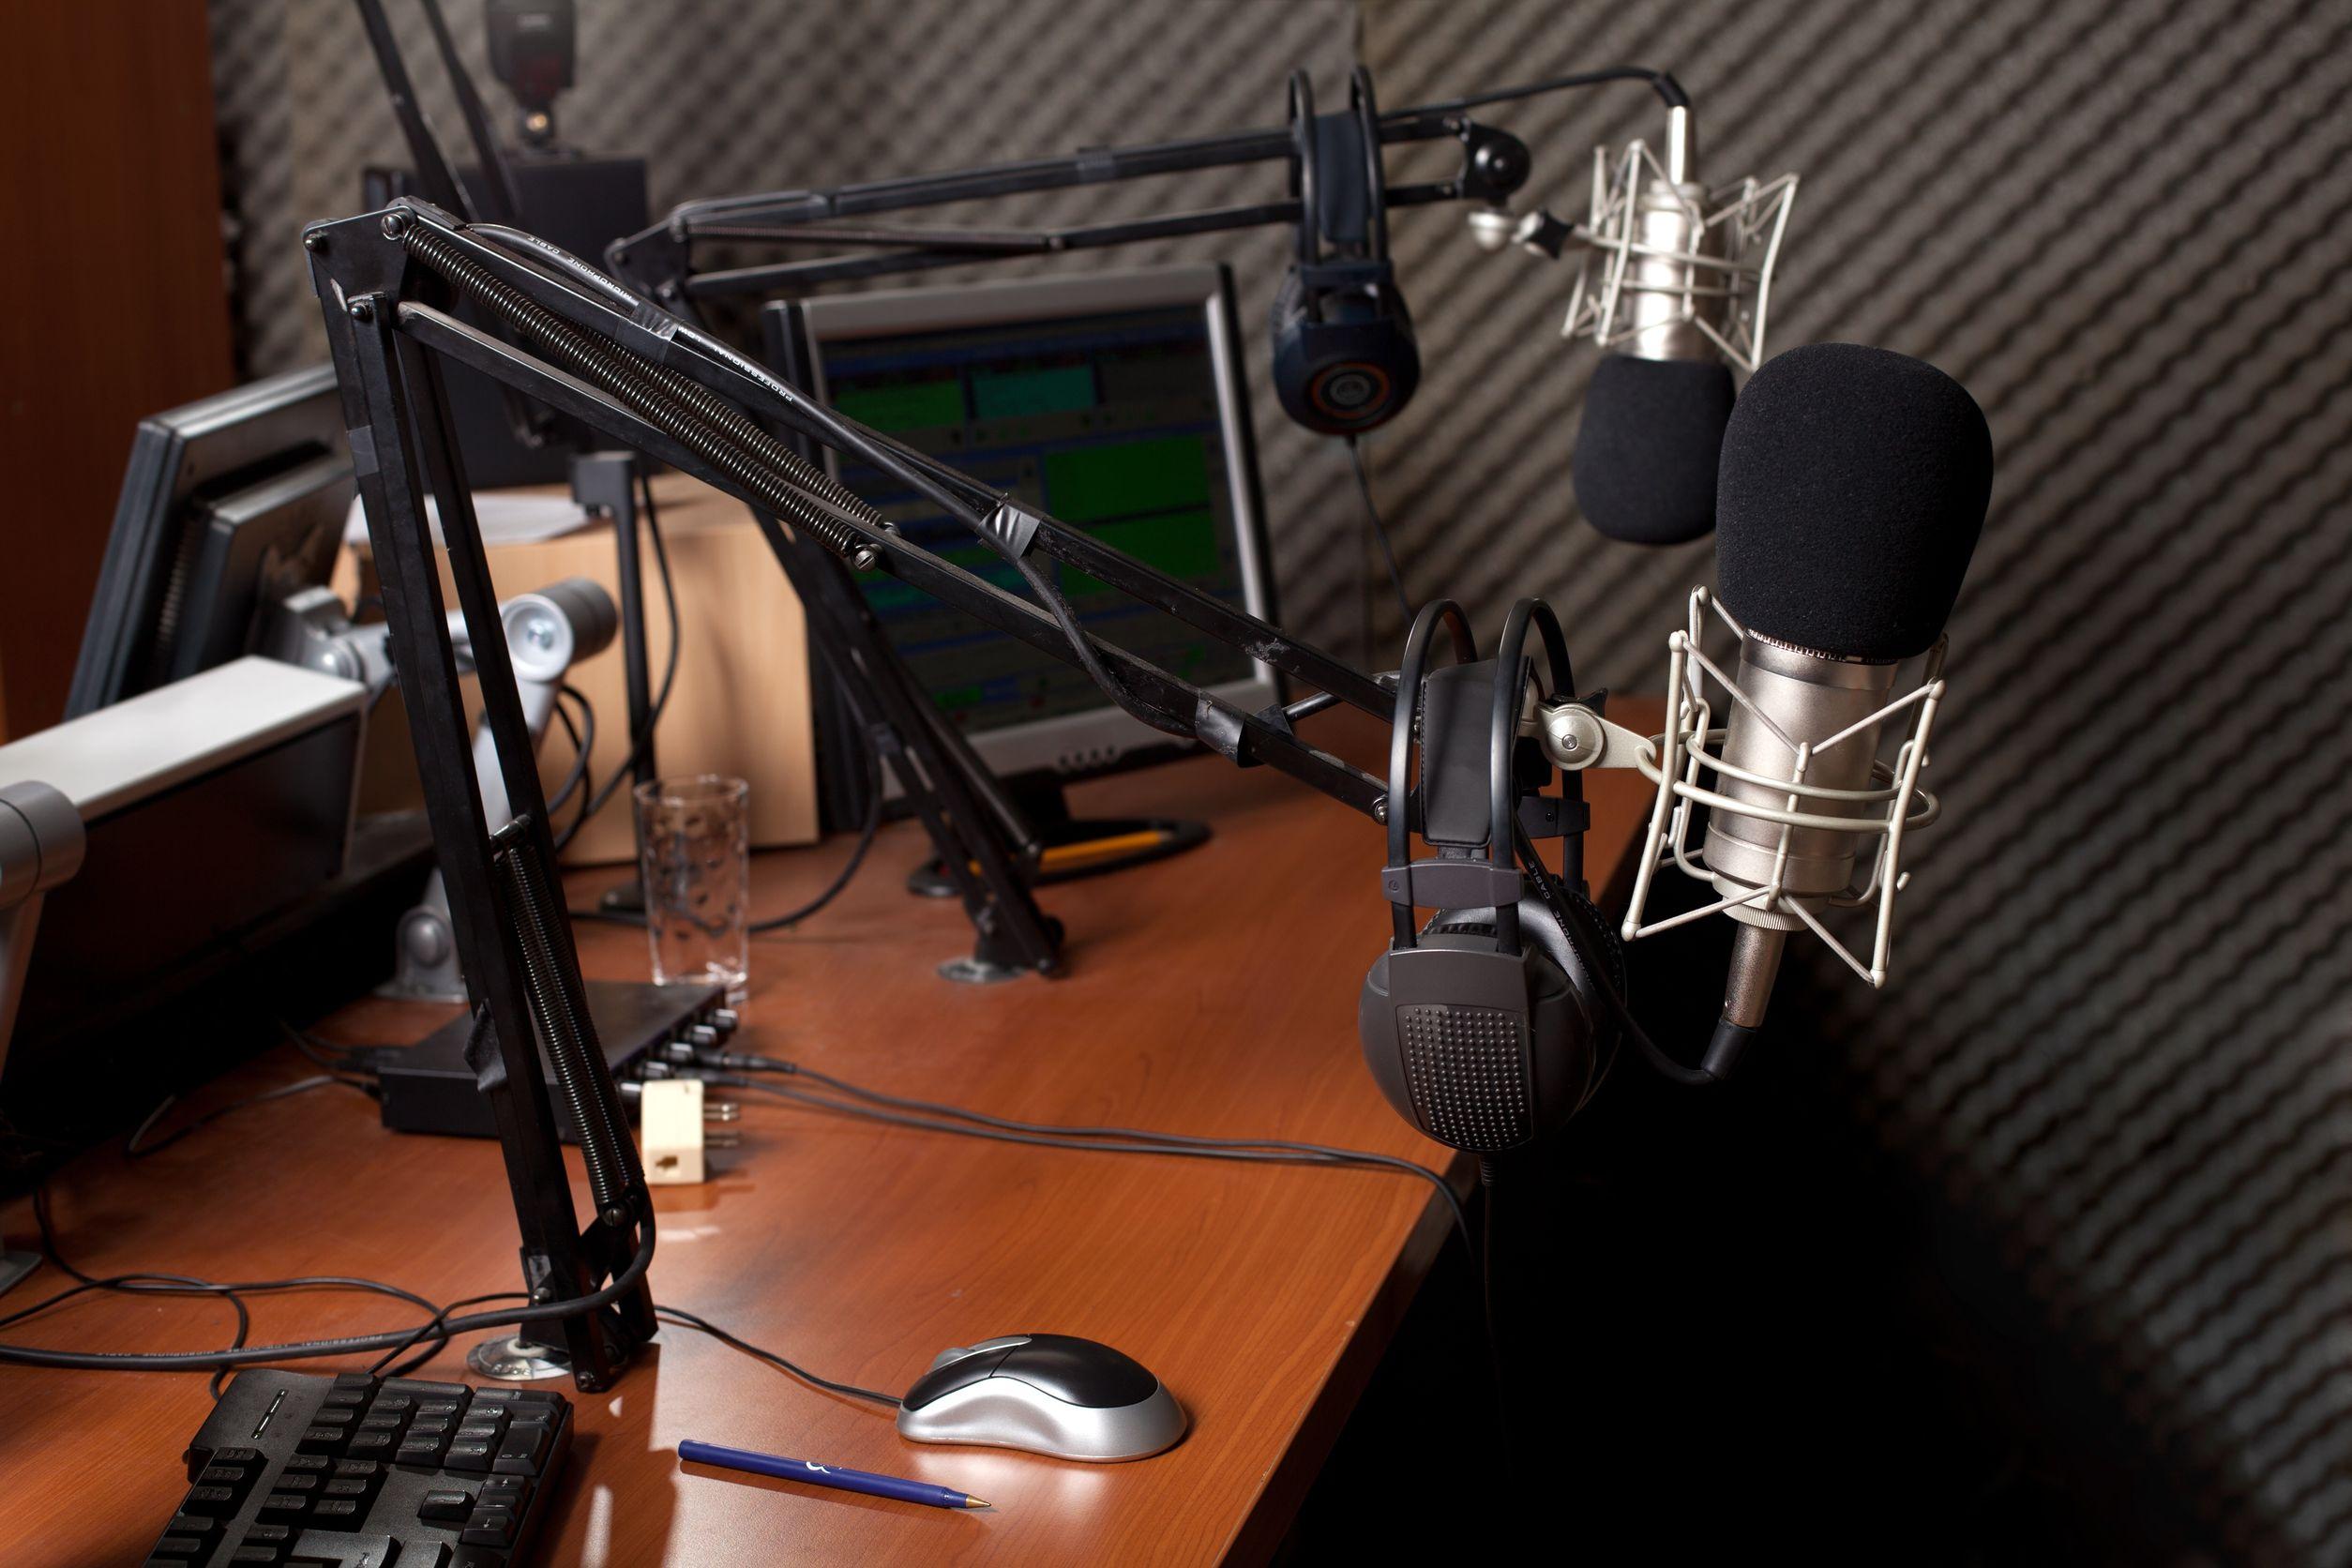 8584870 – preparing the news broadcast